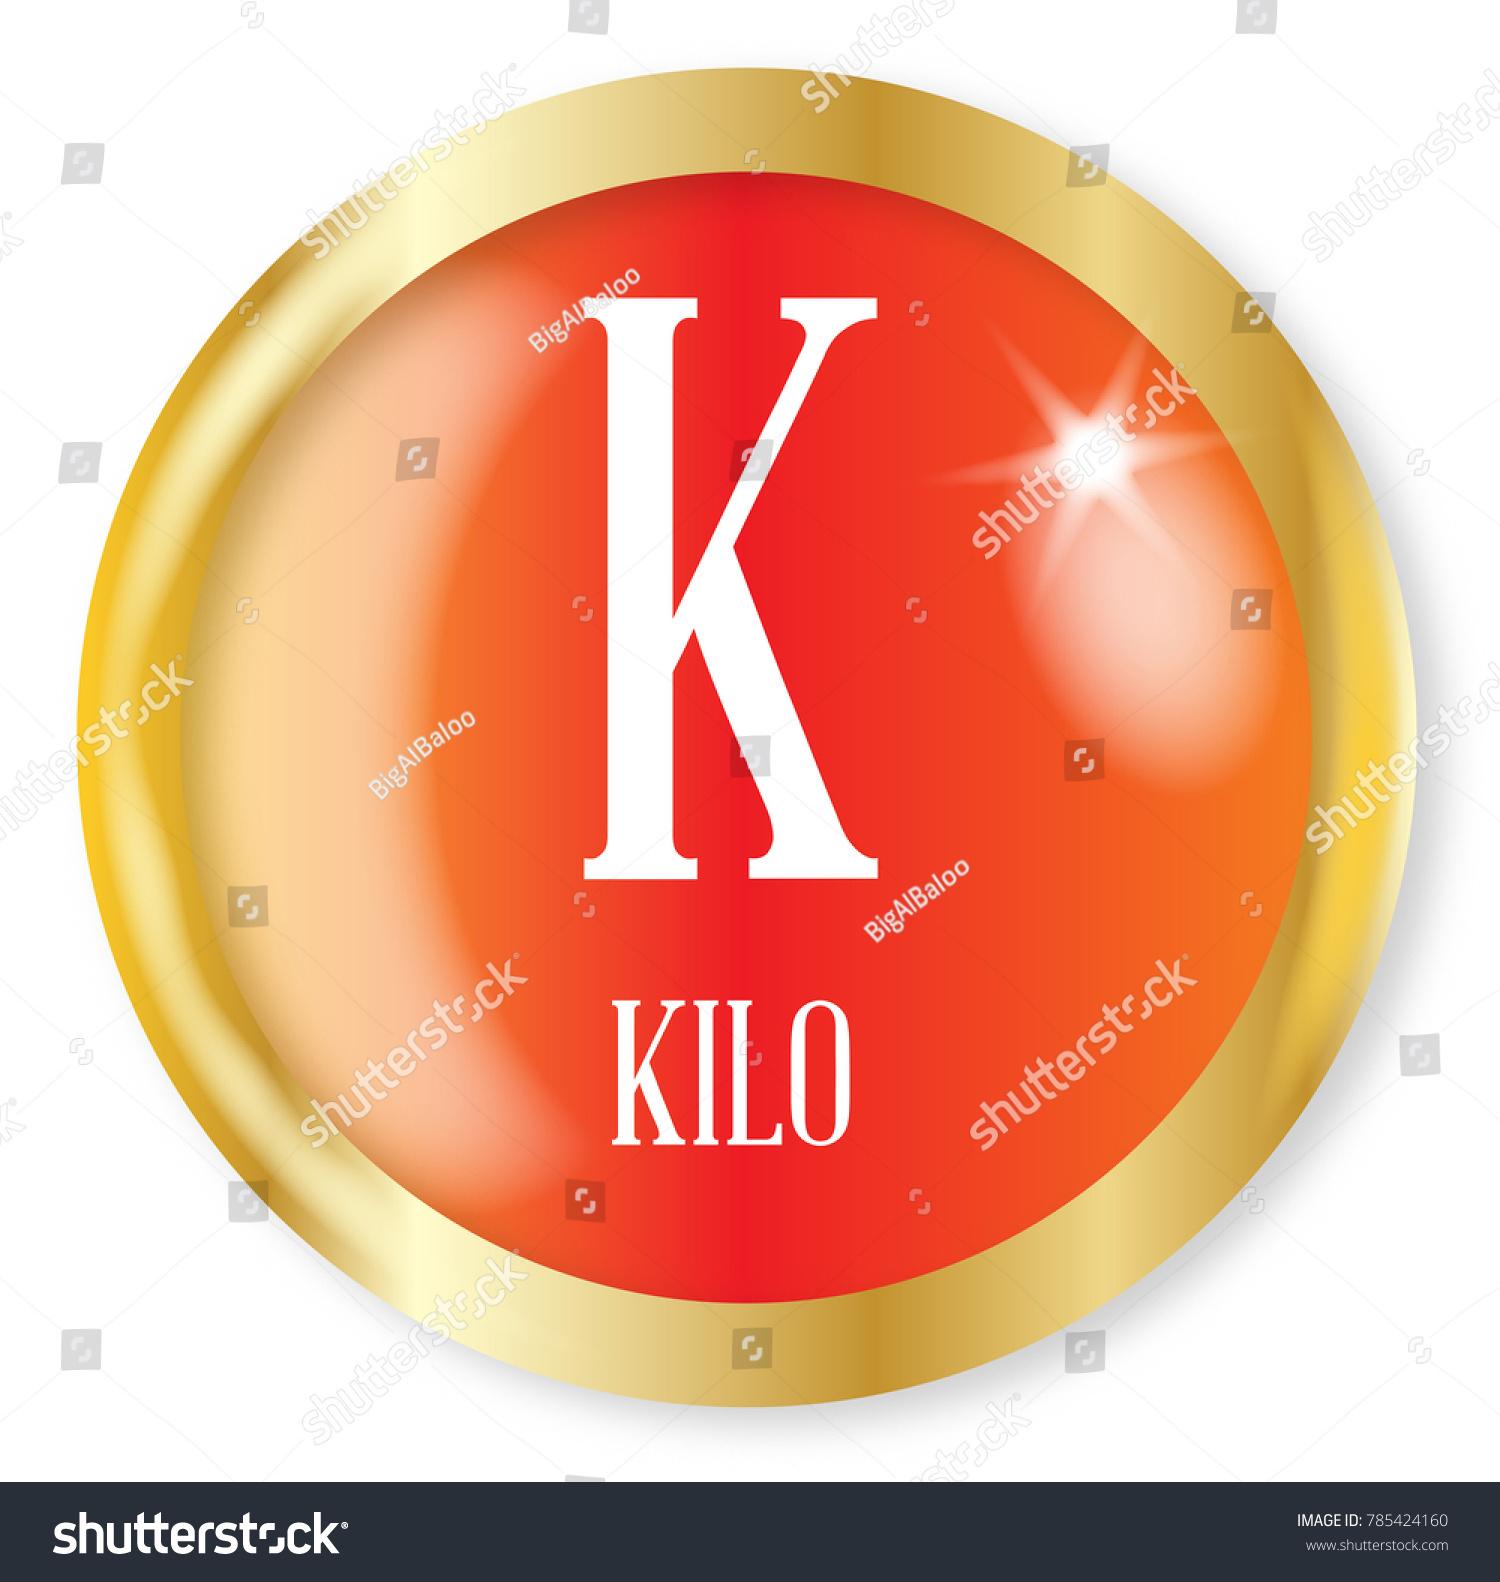 K Kilo Button Nato Phonetic Alphabet Stock Illustration 785424160